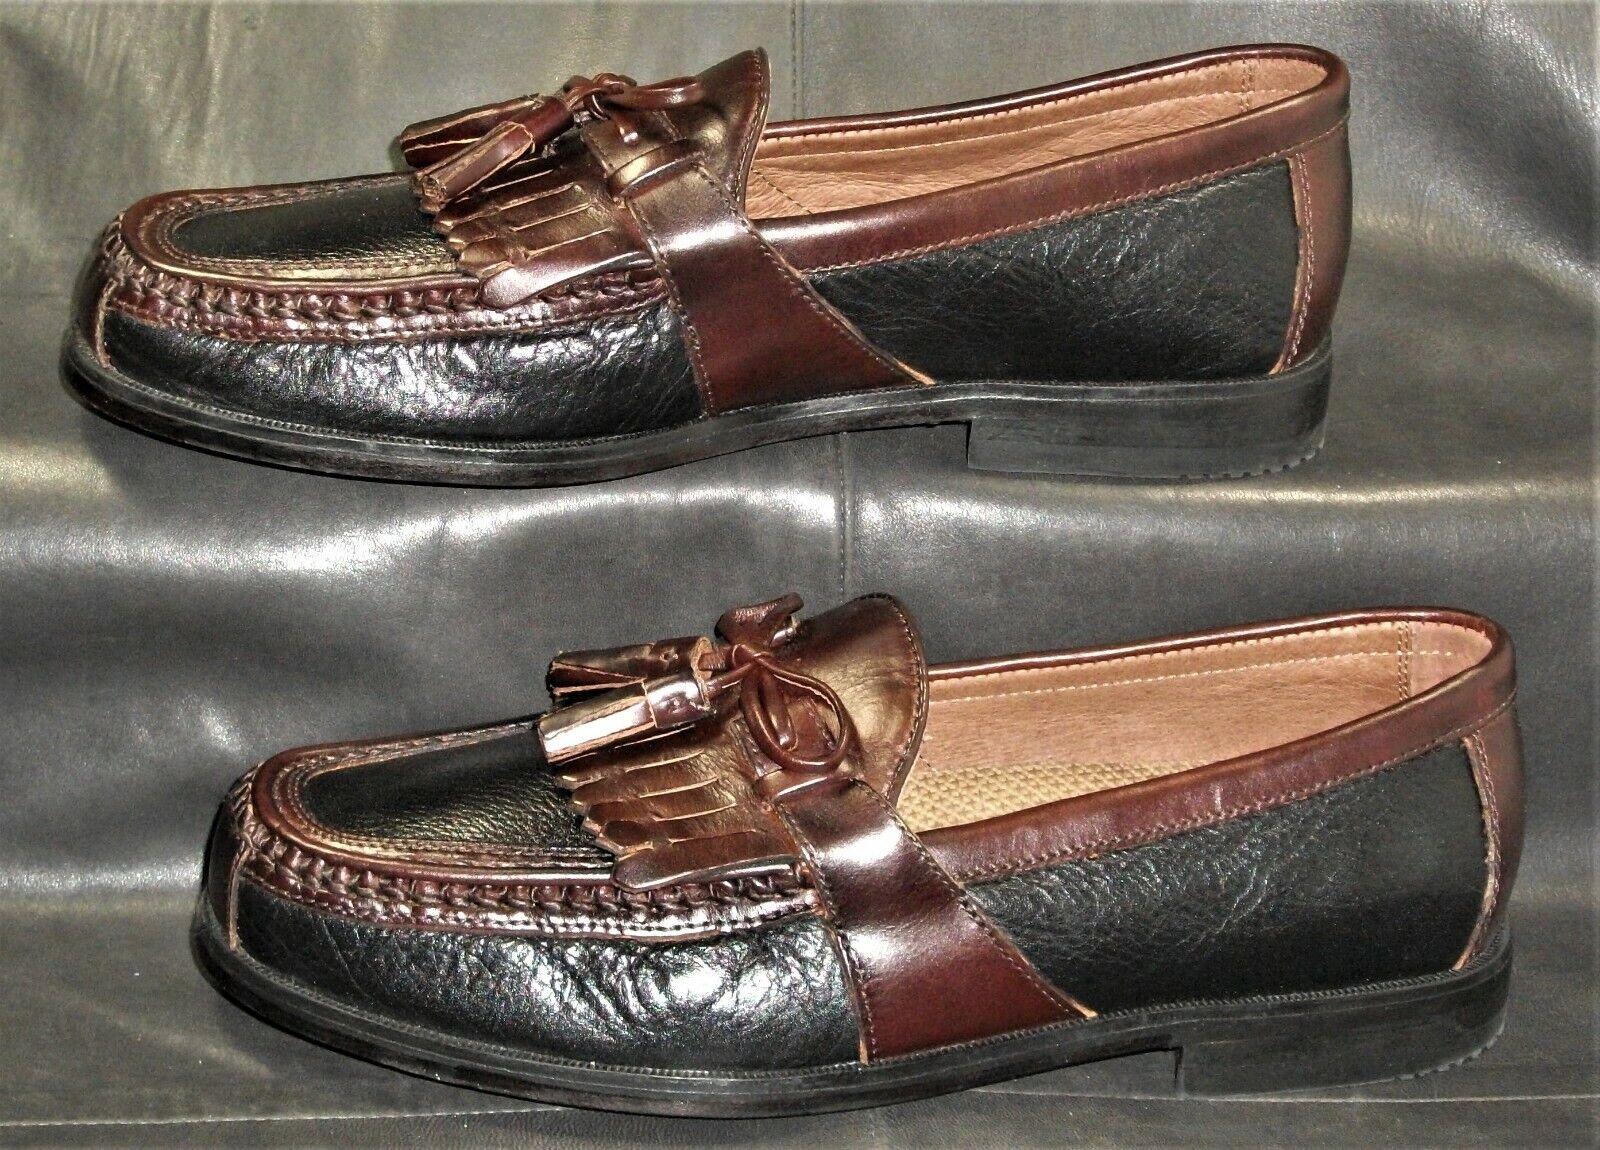 Johnston & Murphy Aragon II black/burgundy leather loafer Men's shoes sz 7 1/2M